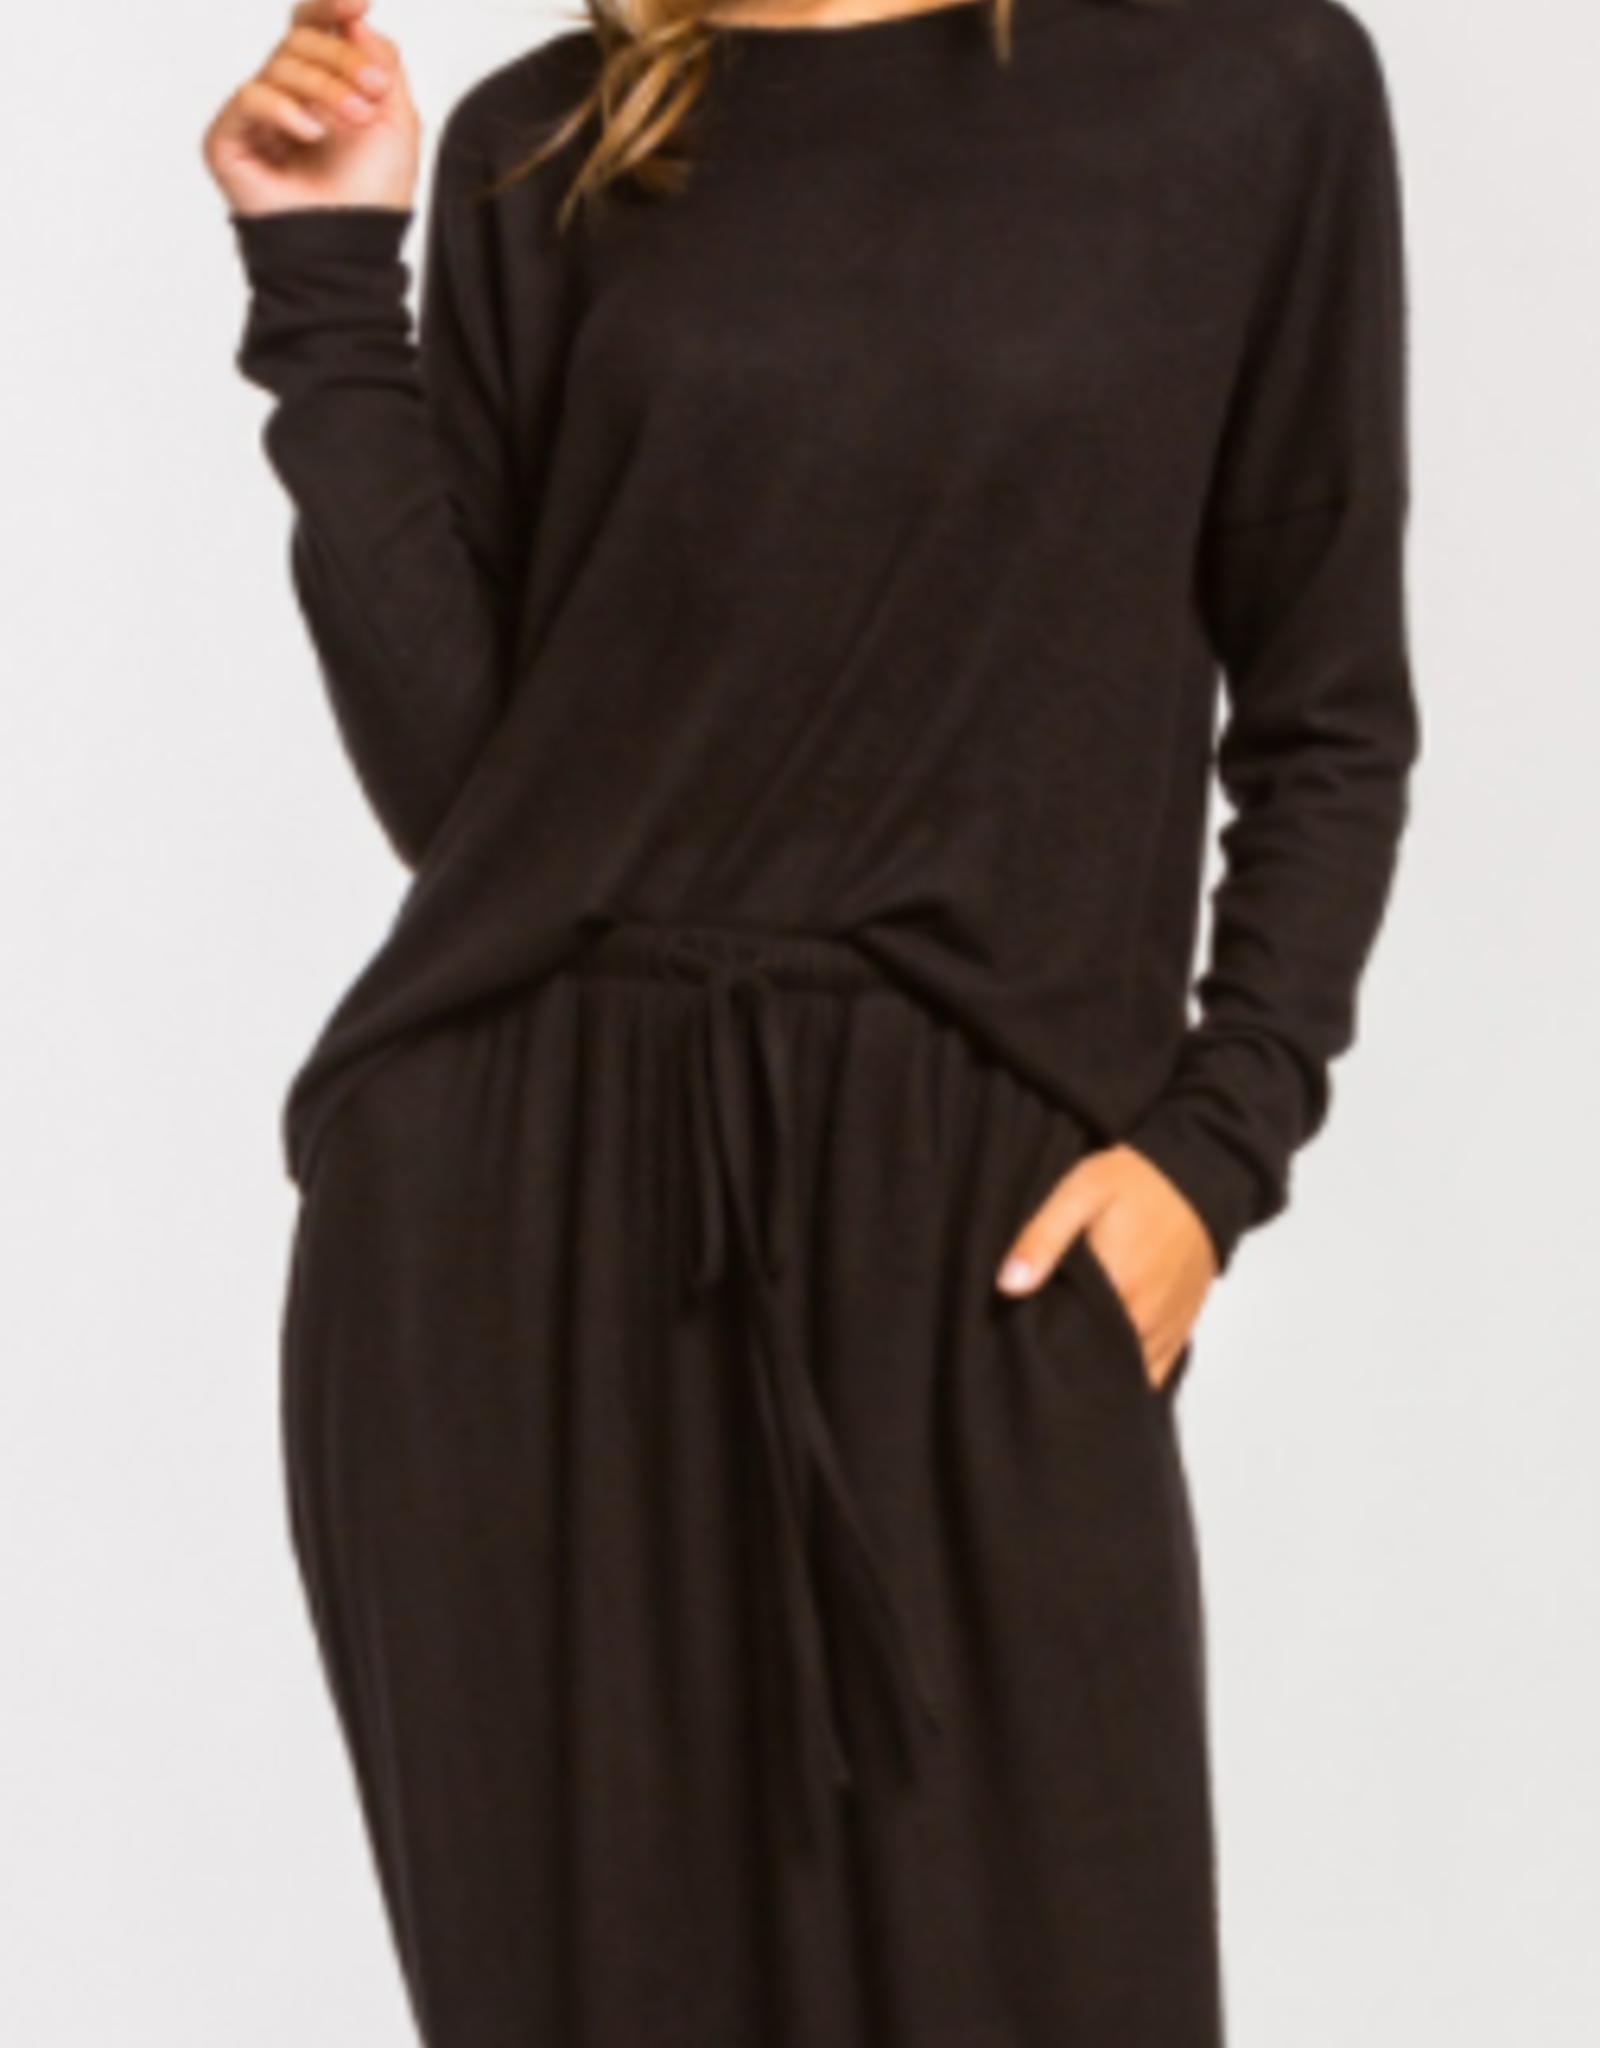 Cherish brushed knit skirt